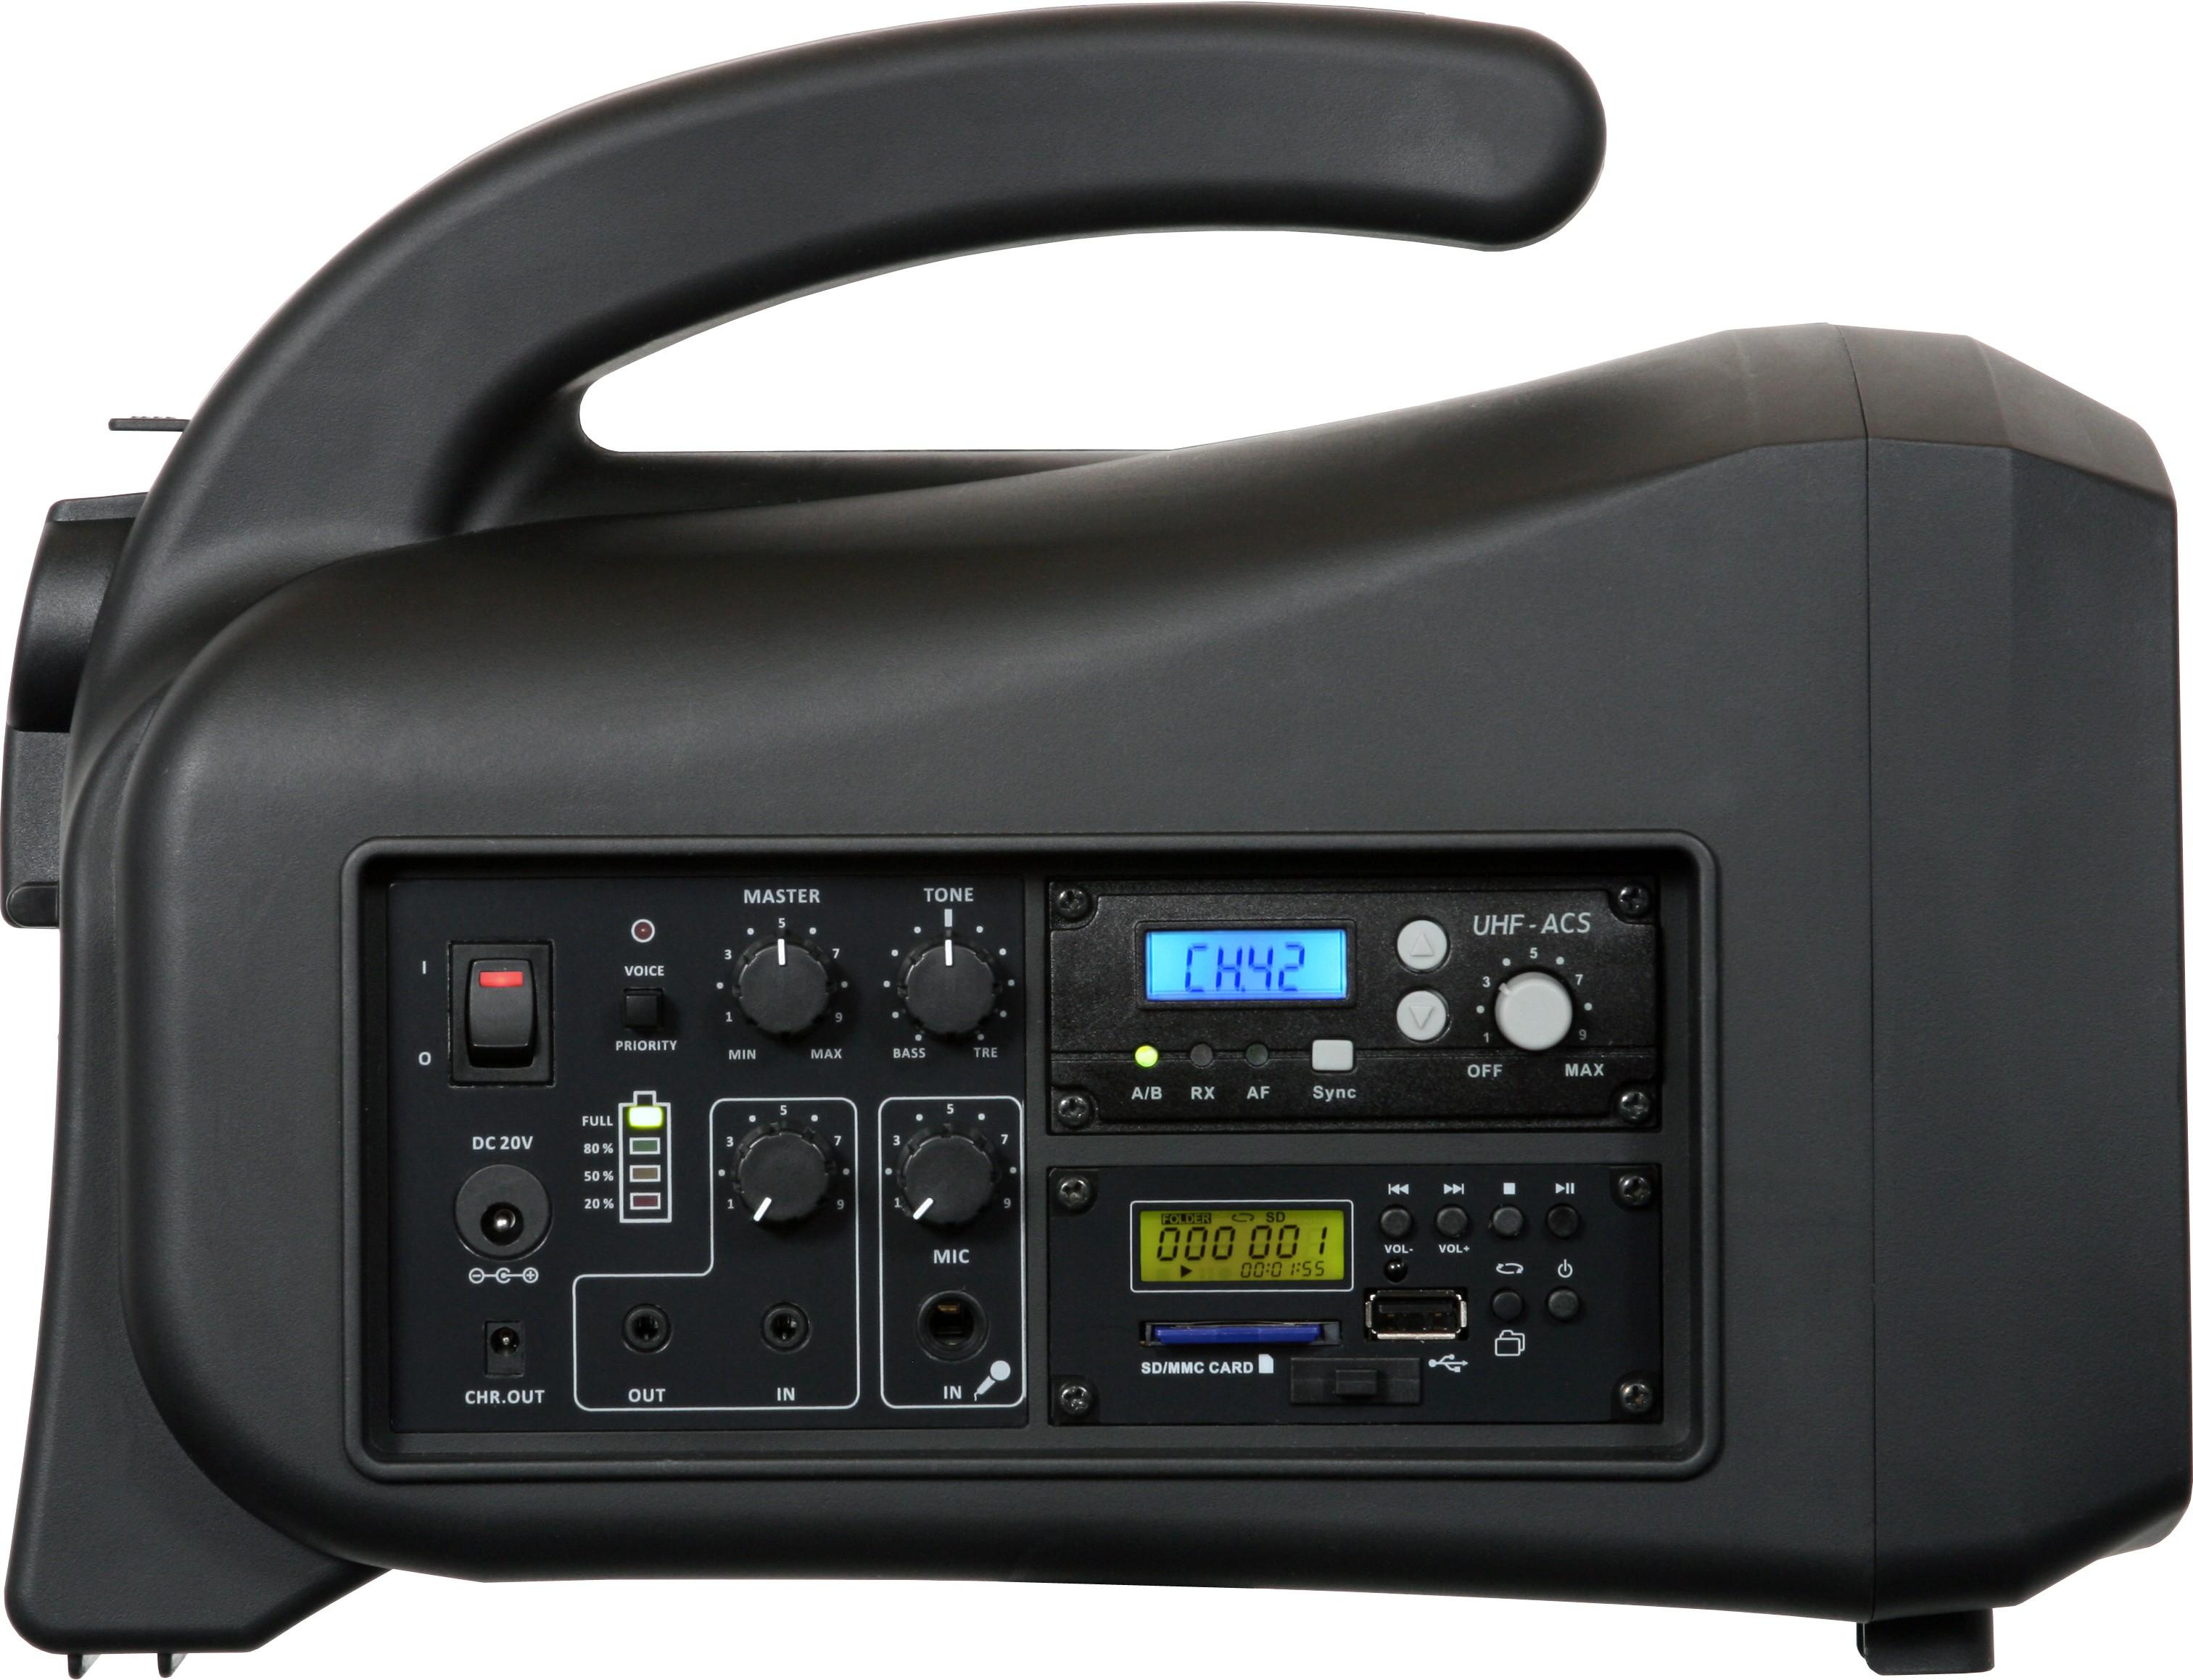 Traveller Wireless Remote Control Galaxy Audio Tv5x Of Traveller Wireless Remote Control